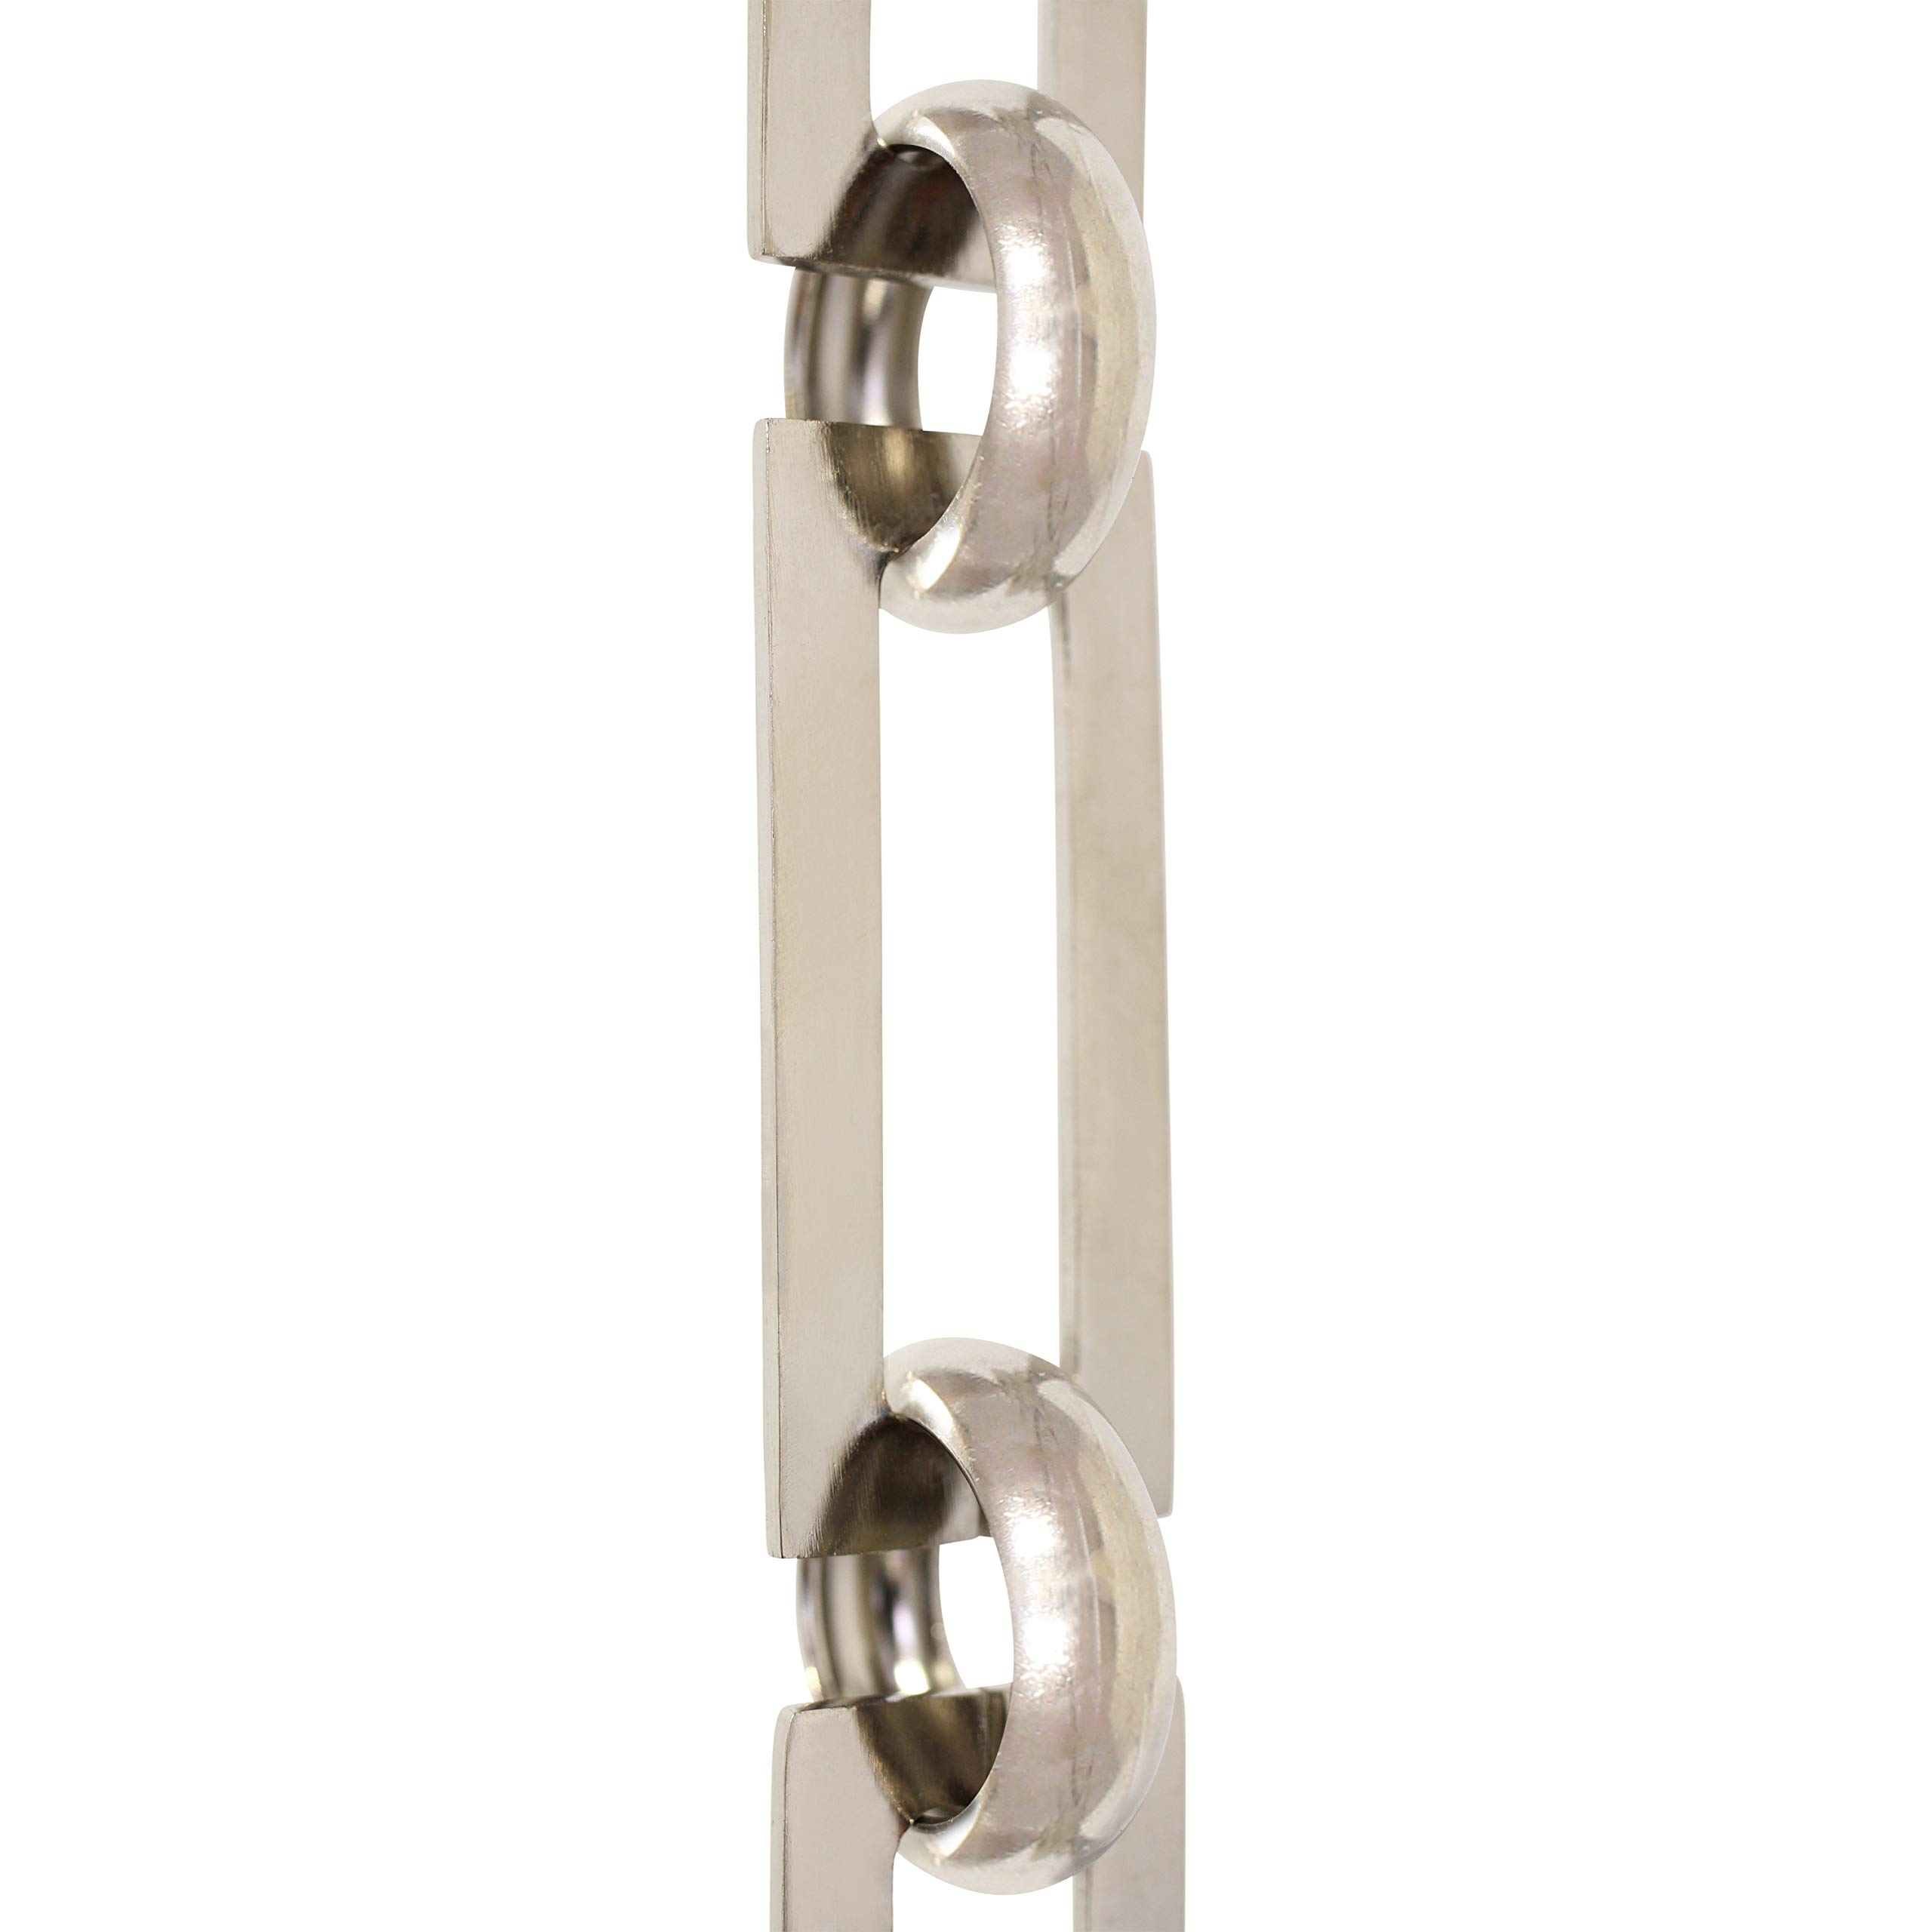 RCH Hardware CH-01-PN Brass Chandelier Chain, Polished Nickel (1 Foot)